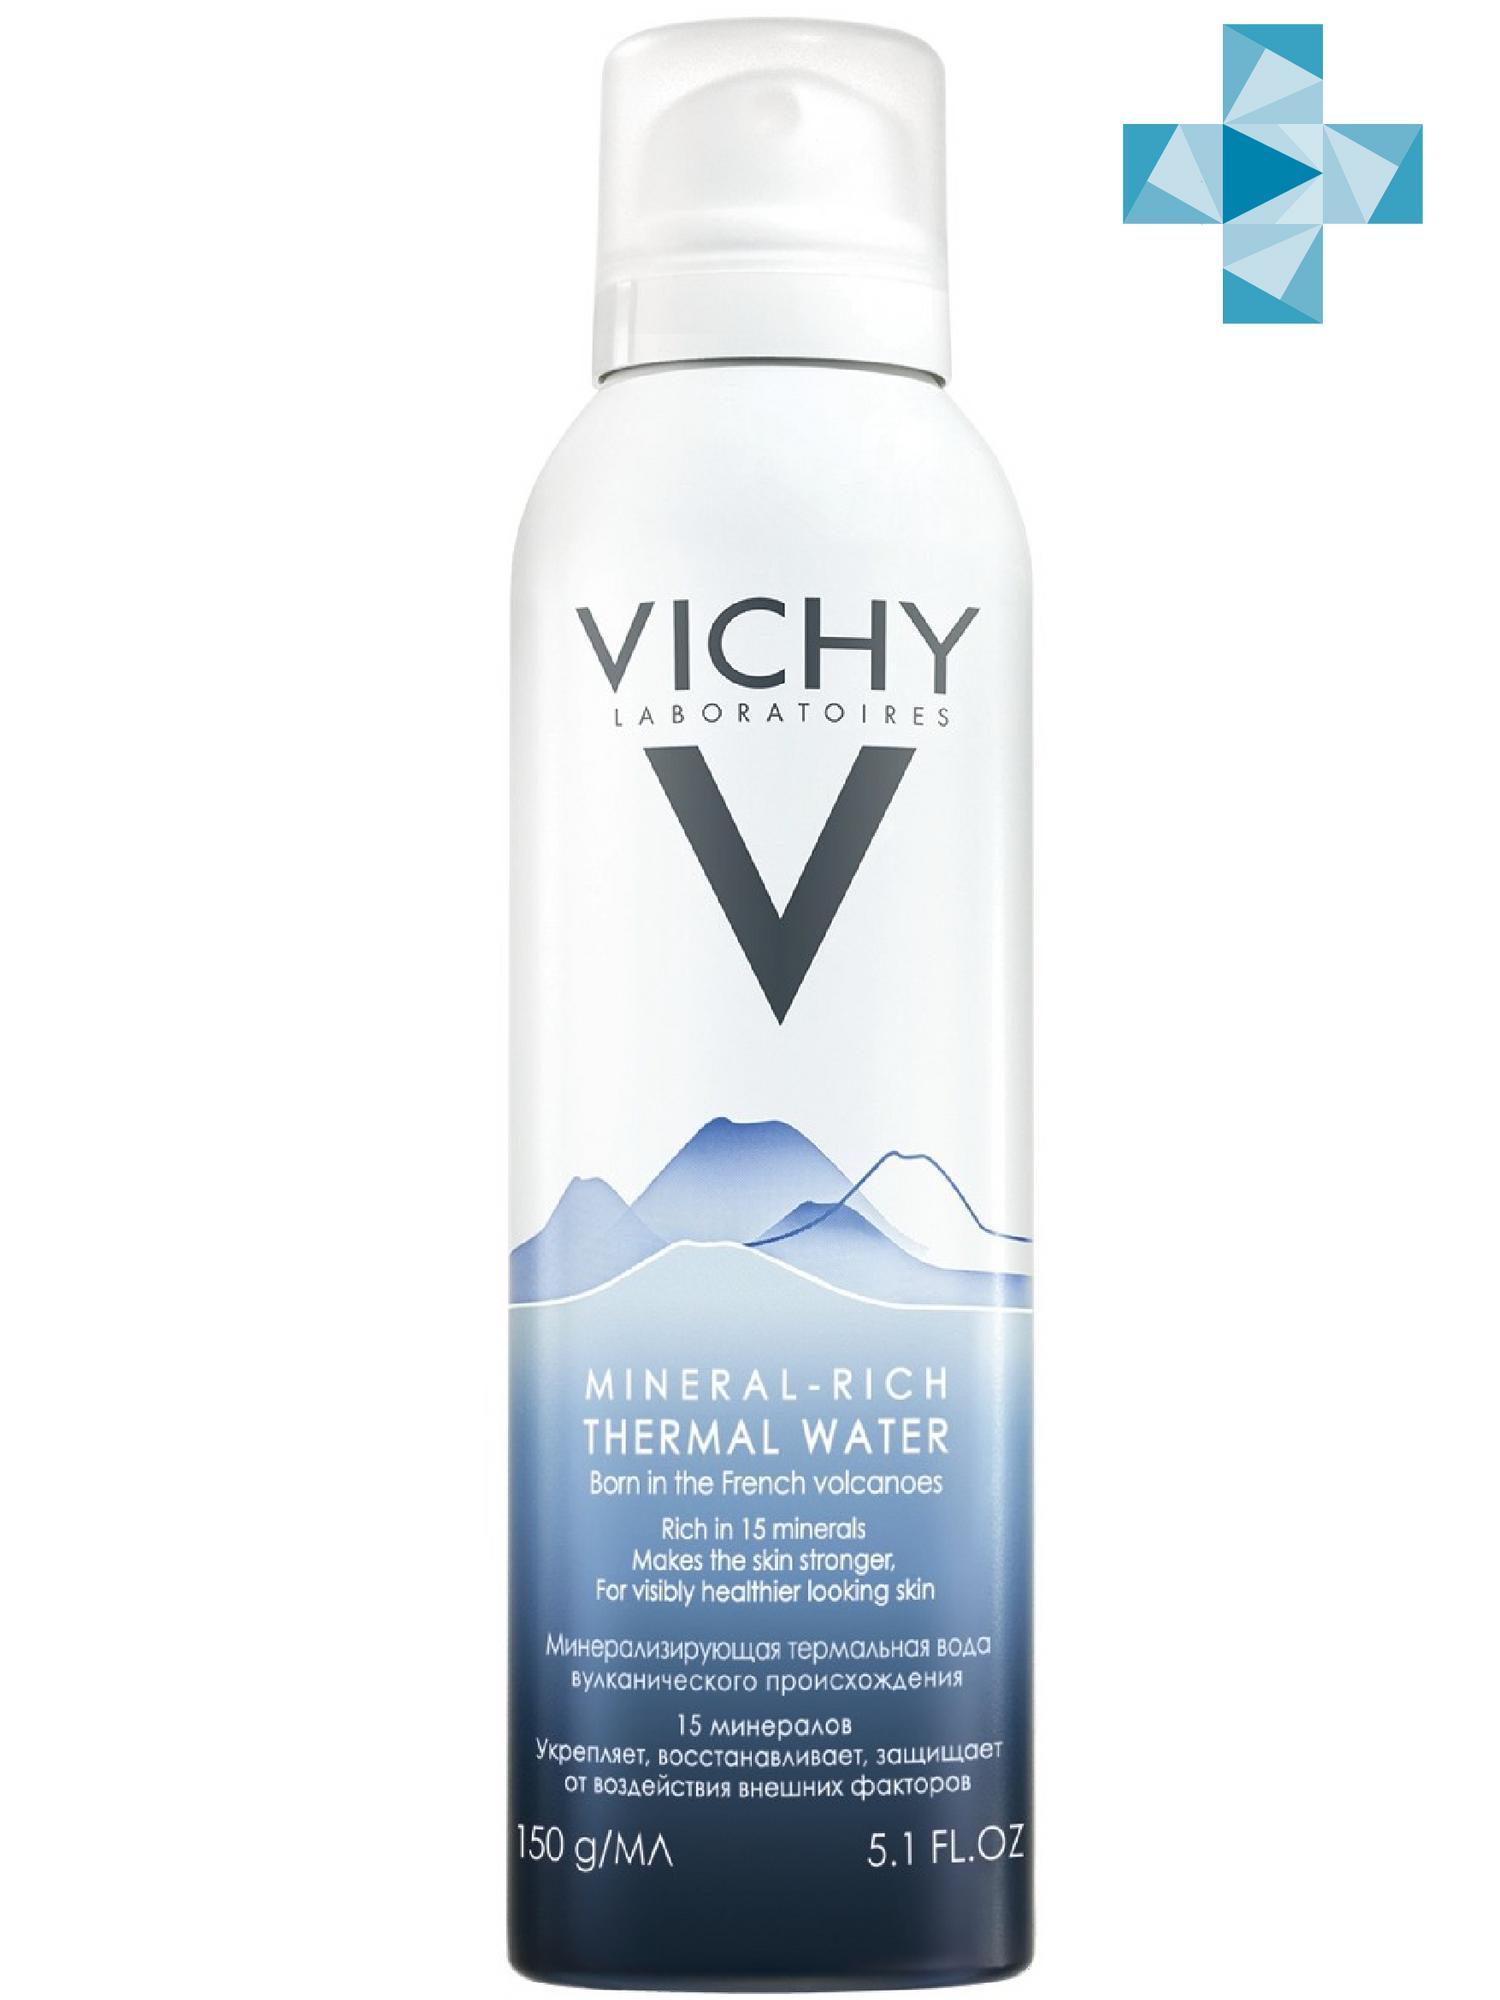 Vichy Термальная Вода Vichy Спа 150 мл (Vichy, Thermal Water Vichy)